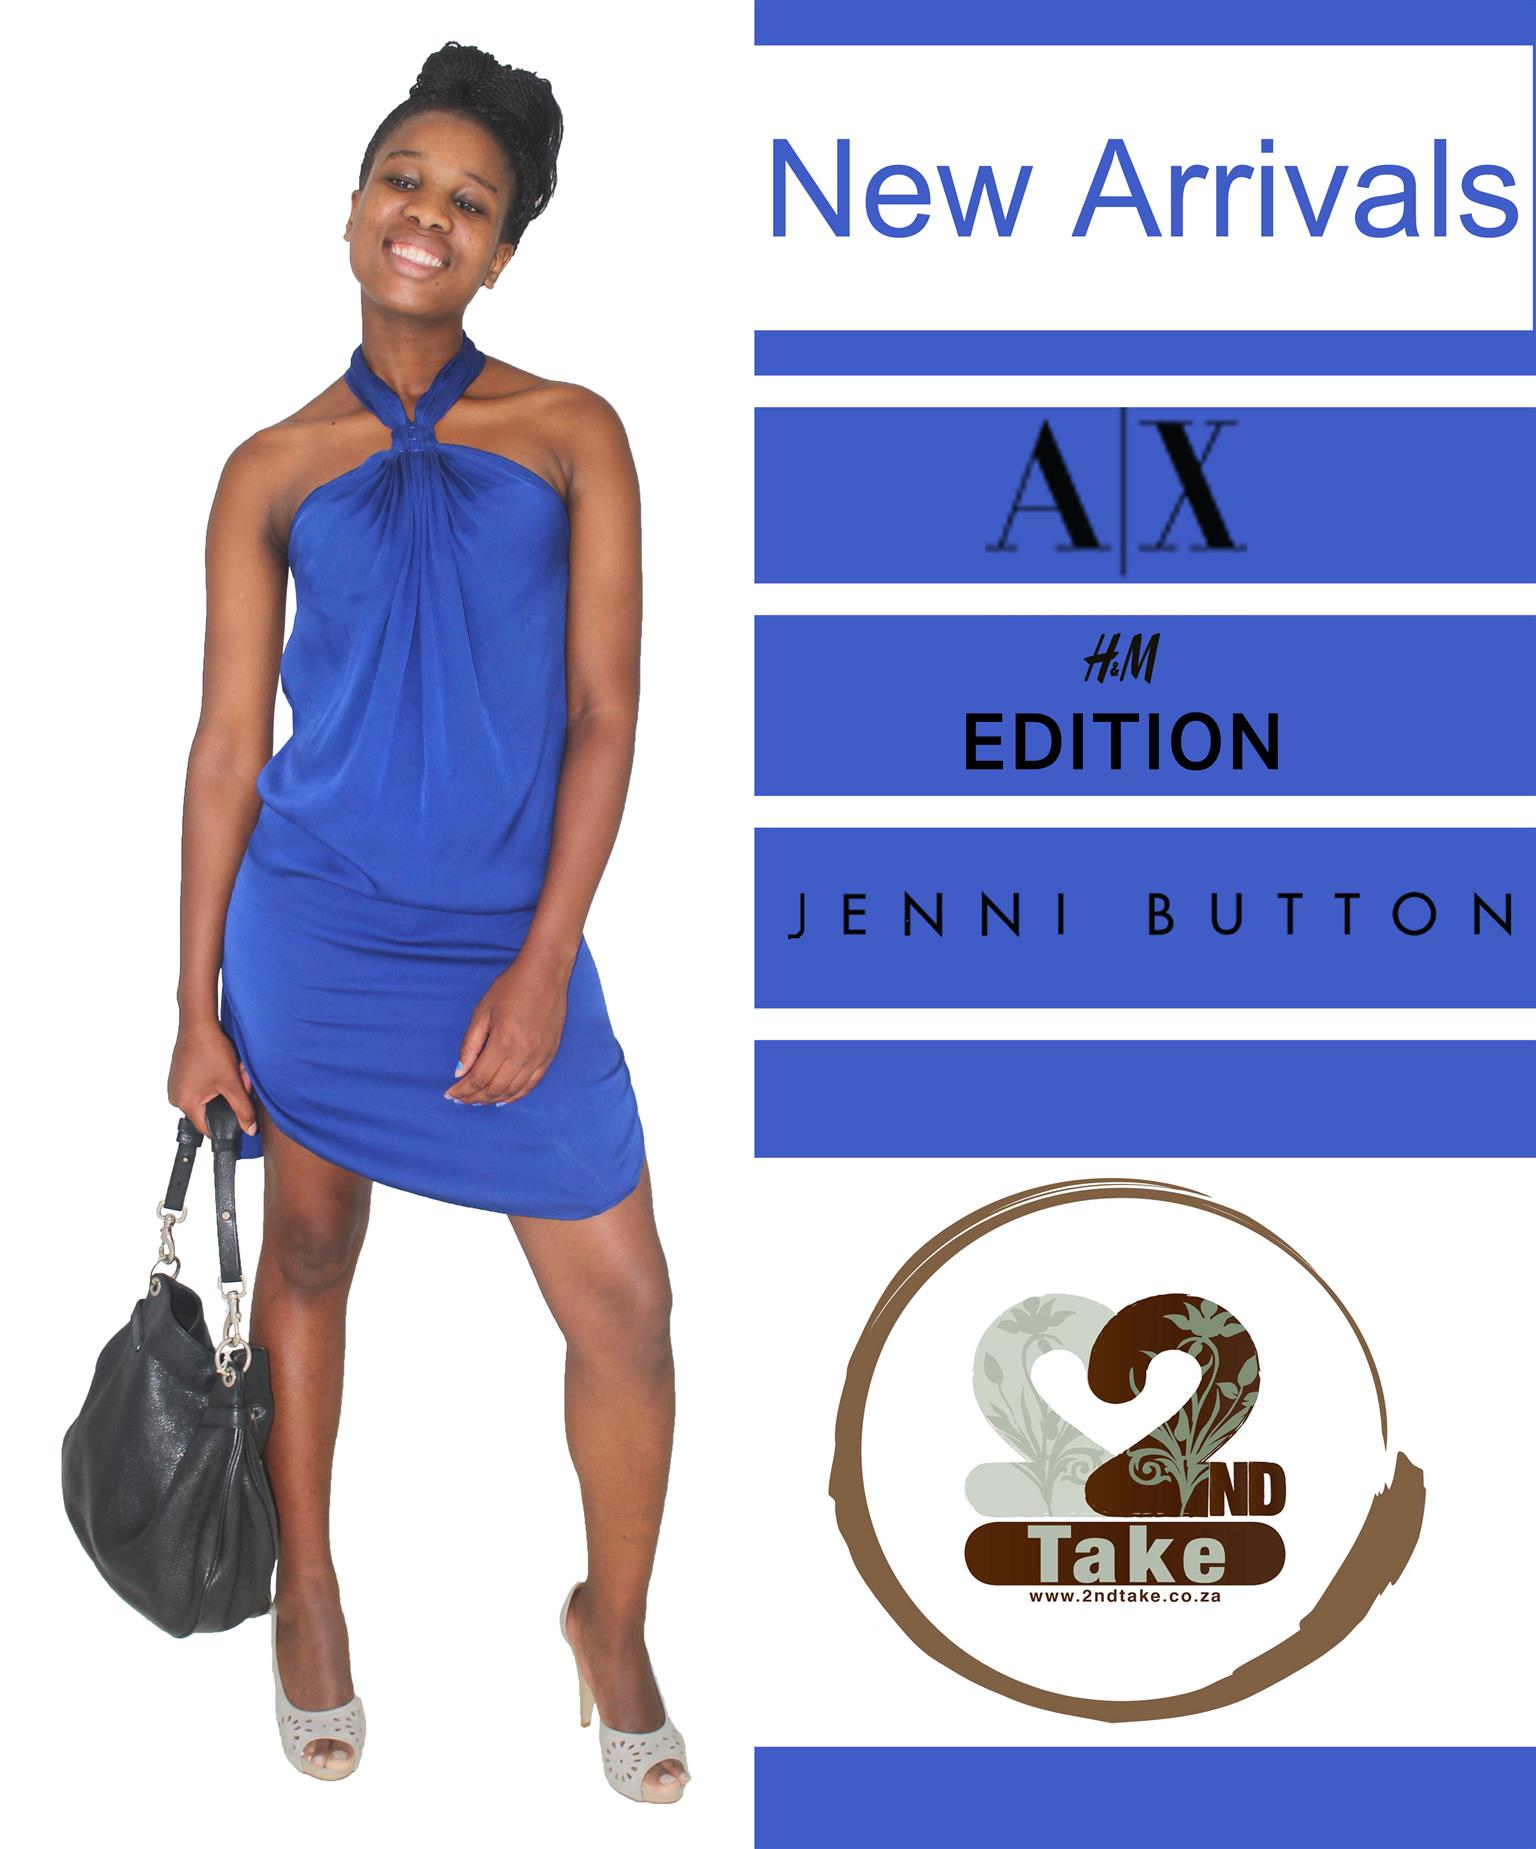 Prada, Mango and Zara fashion at discounted prices available at 2nd Take!